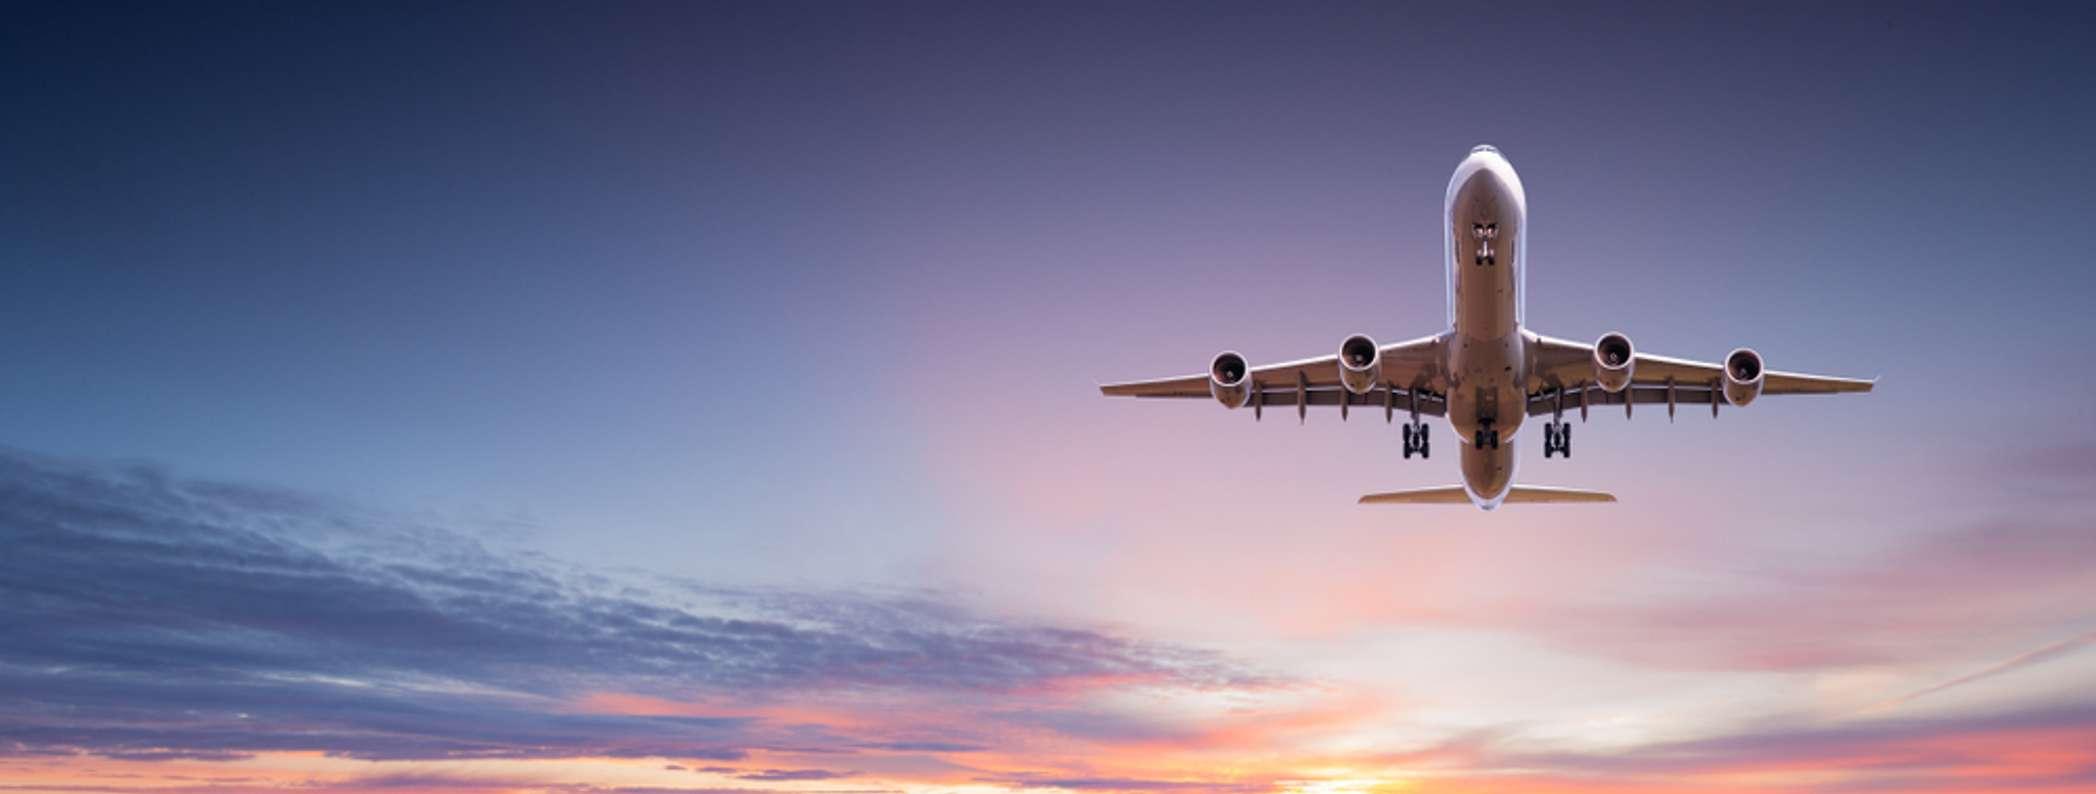 LCCを含む国内線主要航空会社のシートピッチや快適度を比較